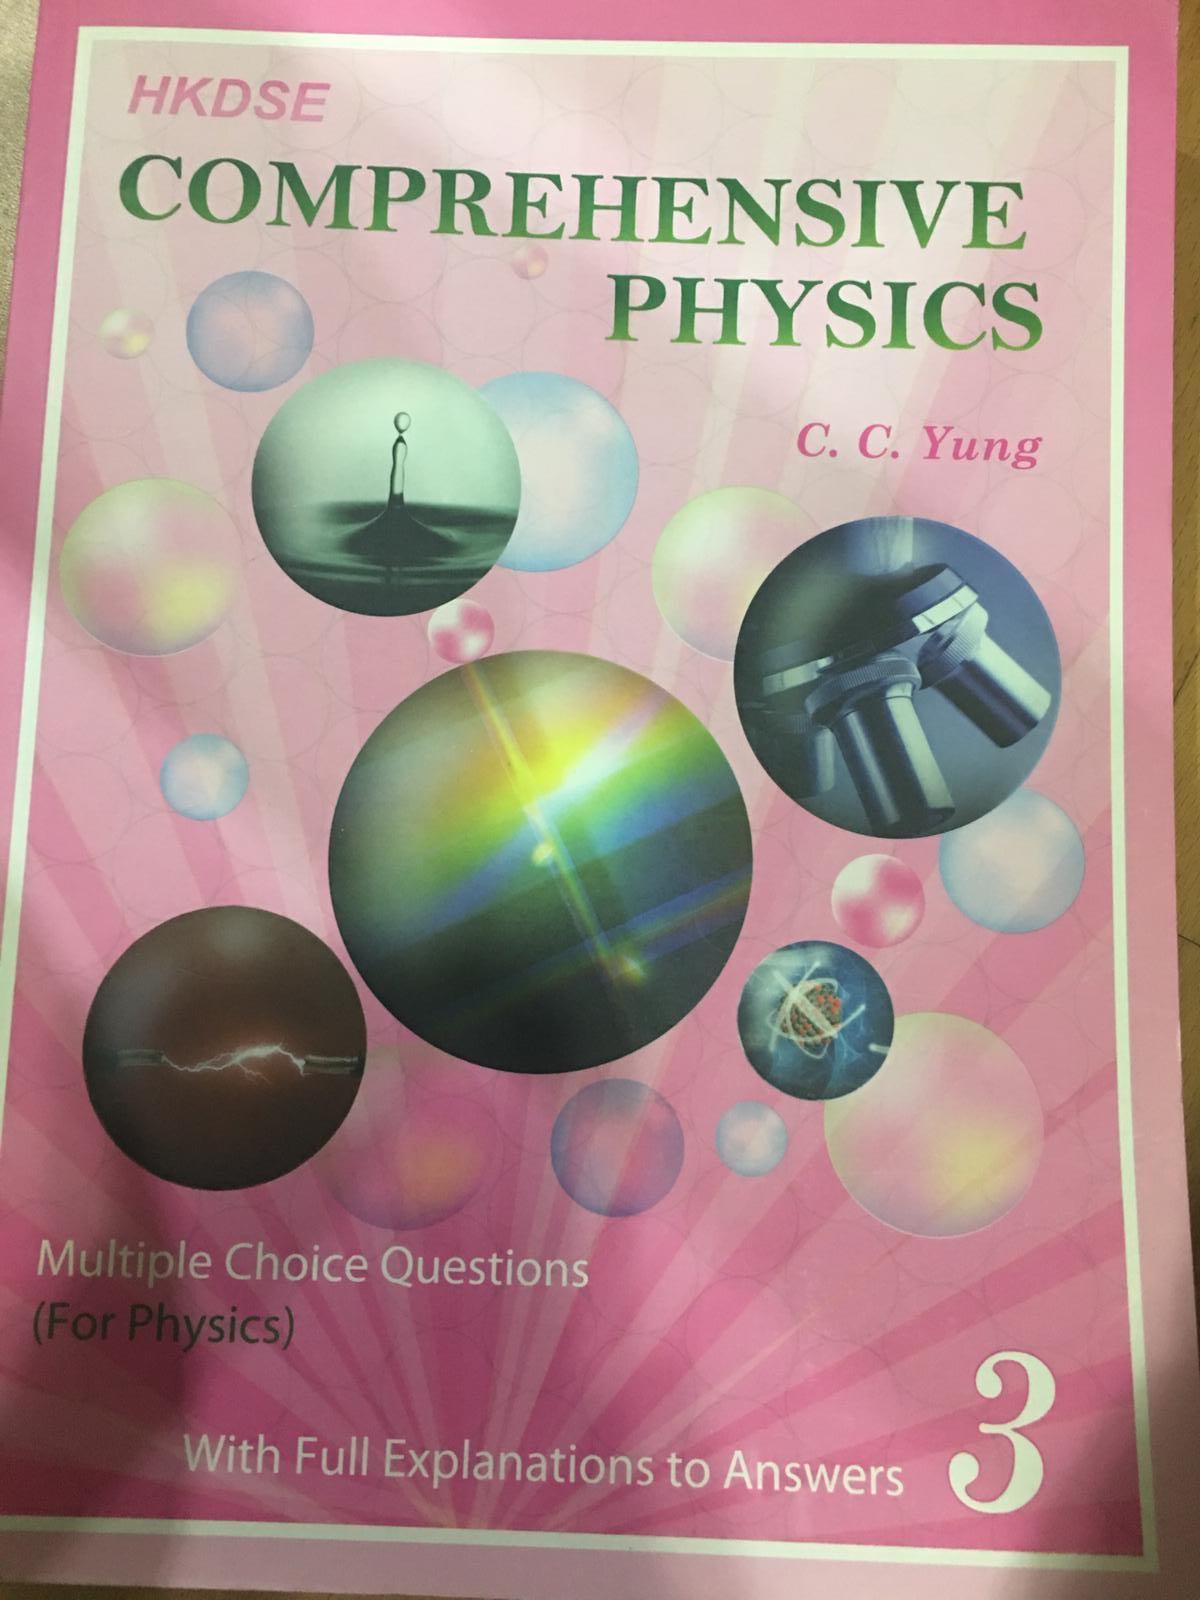 Physics mc exercise (comprehensive physics)